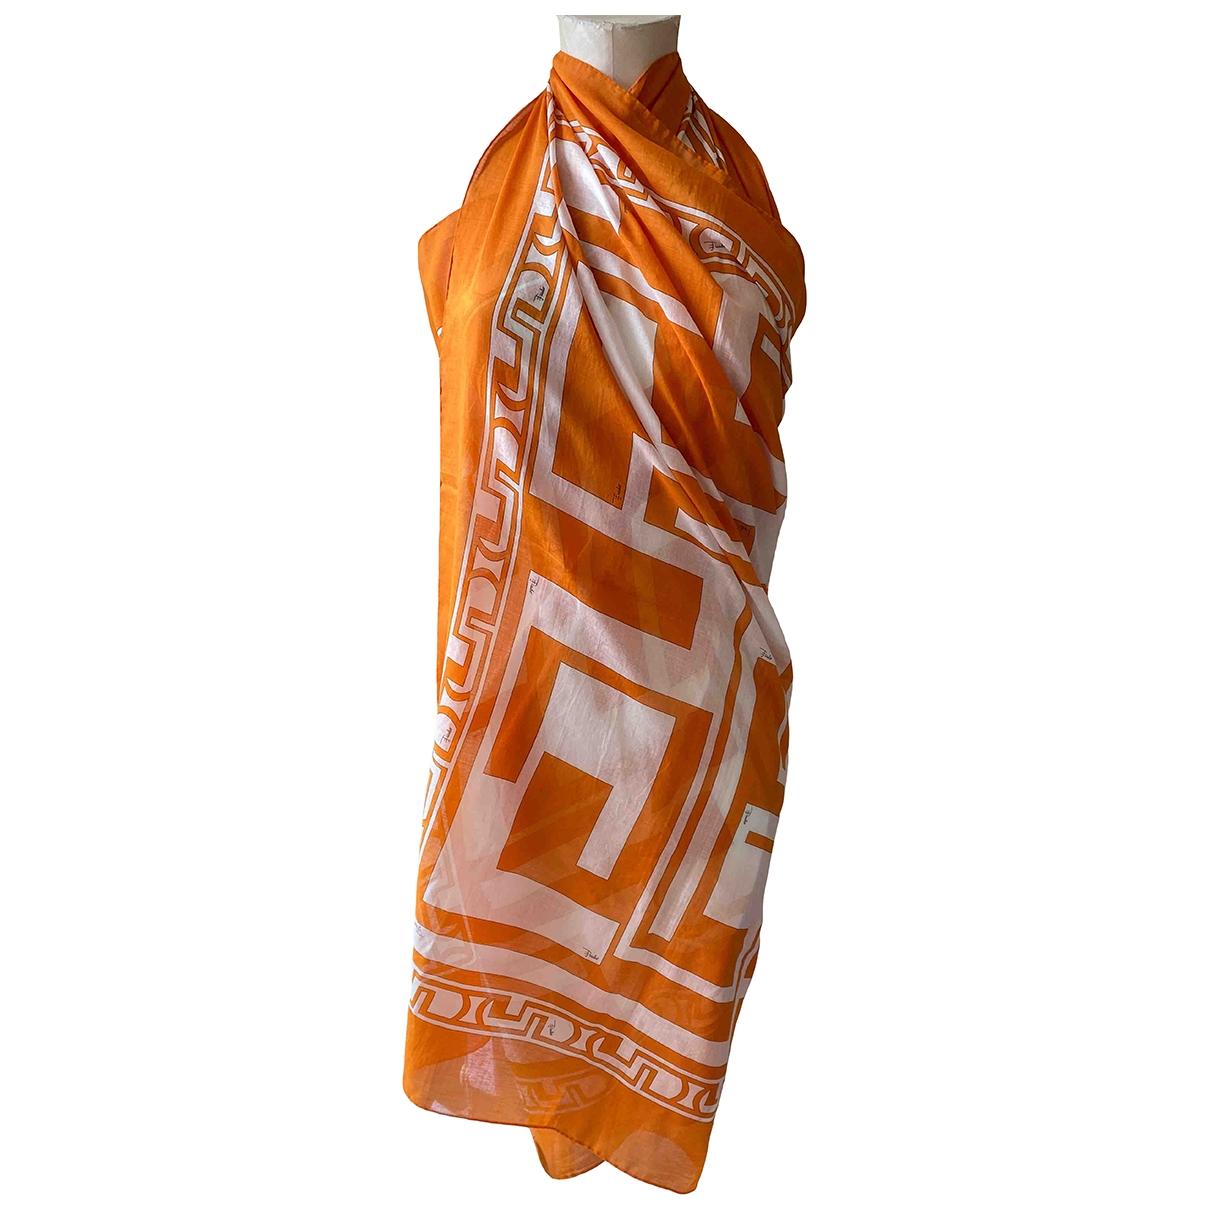 Bañadore en Algodon Naranja Emilio Pucci